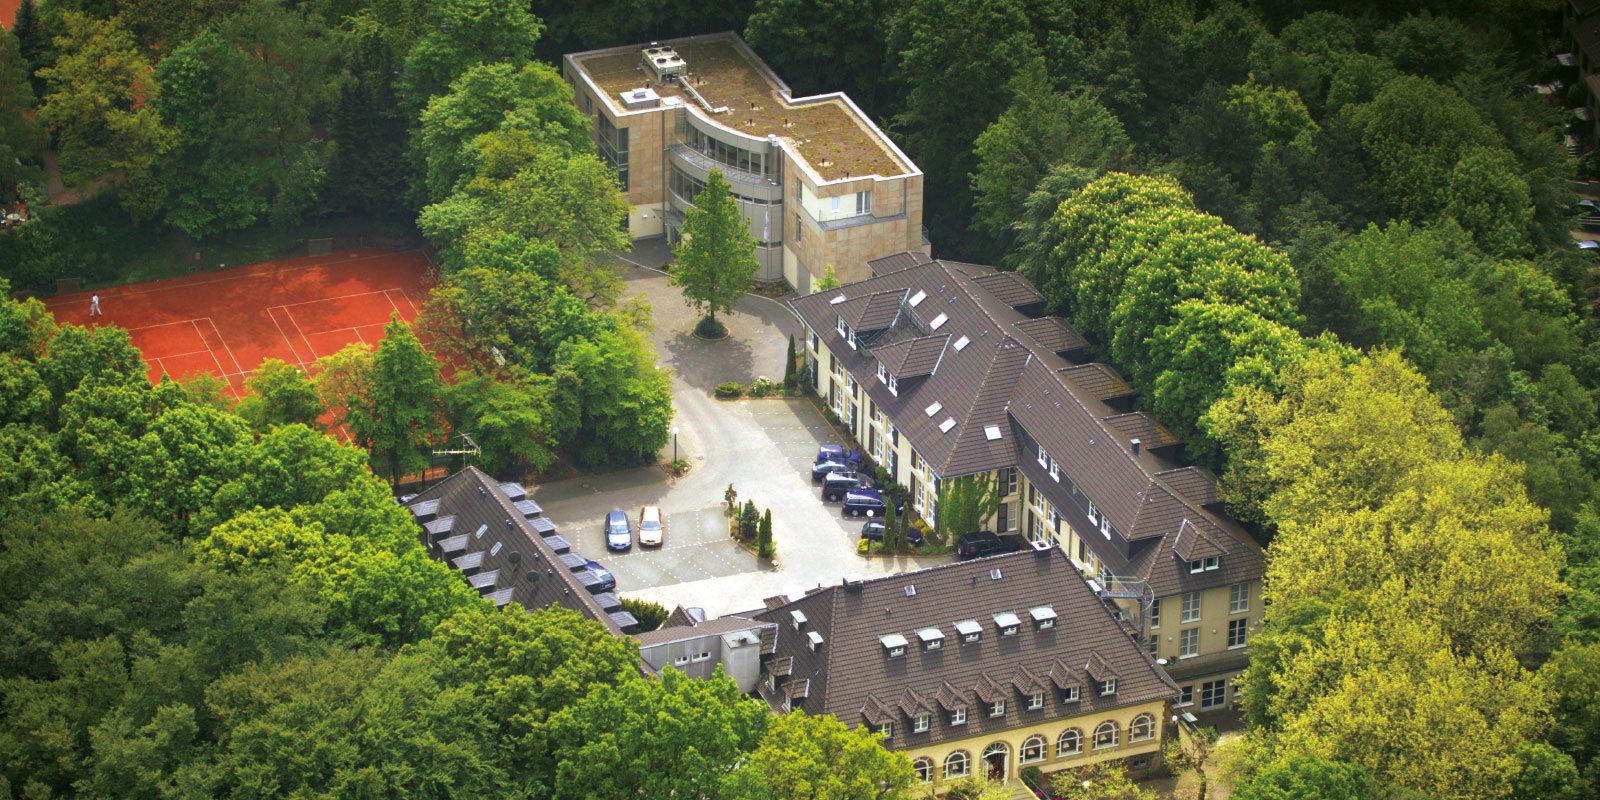 Waldhotel Düsseldorf